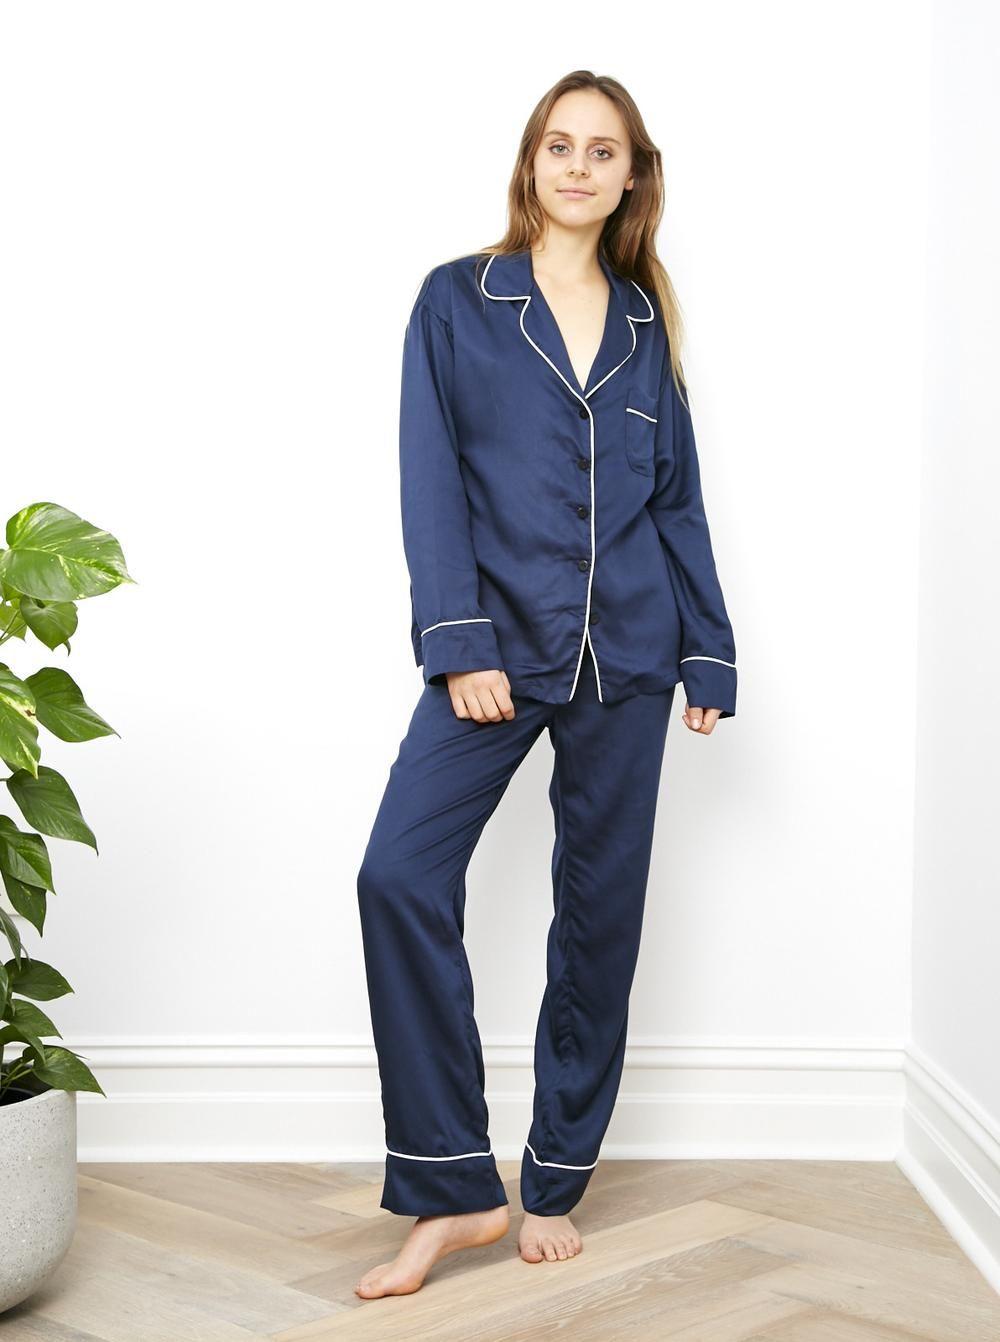 Blue Nights Long Sleeve Pj Shirt from ettitude.com.au    Street Style Pjs +  Bedtime Pjs fa9c17ab7